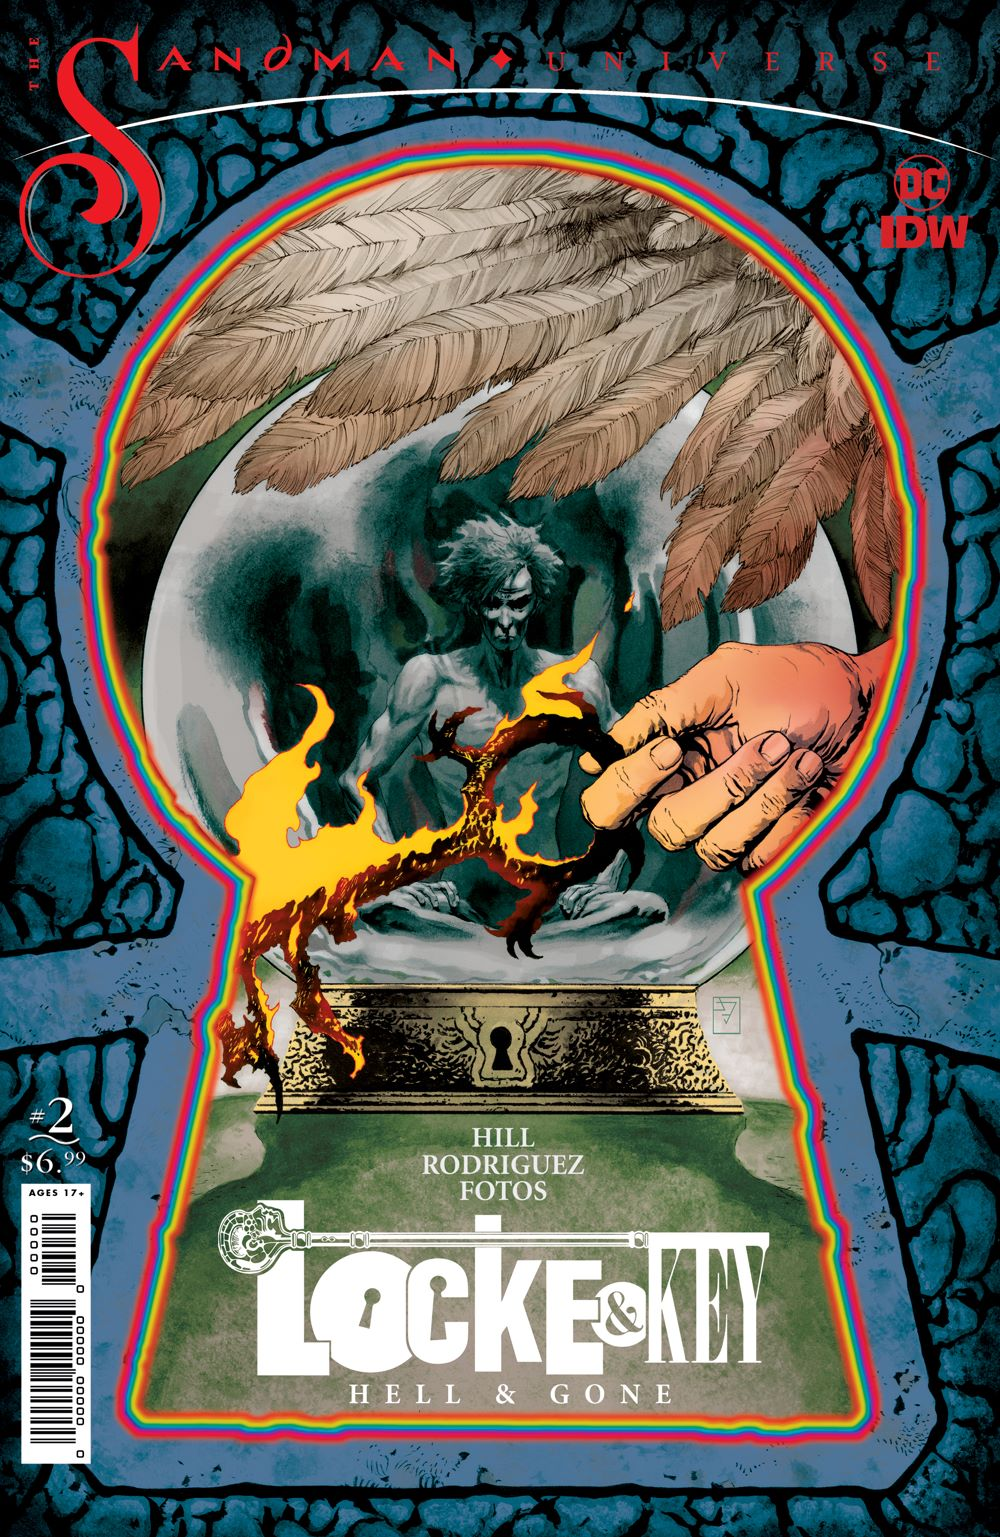 SUNI_LK_HG_Cv2_var_JH_Williams DC Comics August 2021 Solicitations